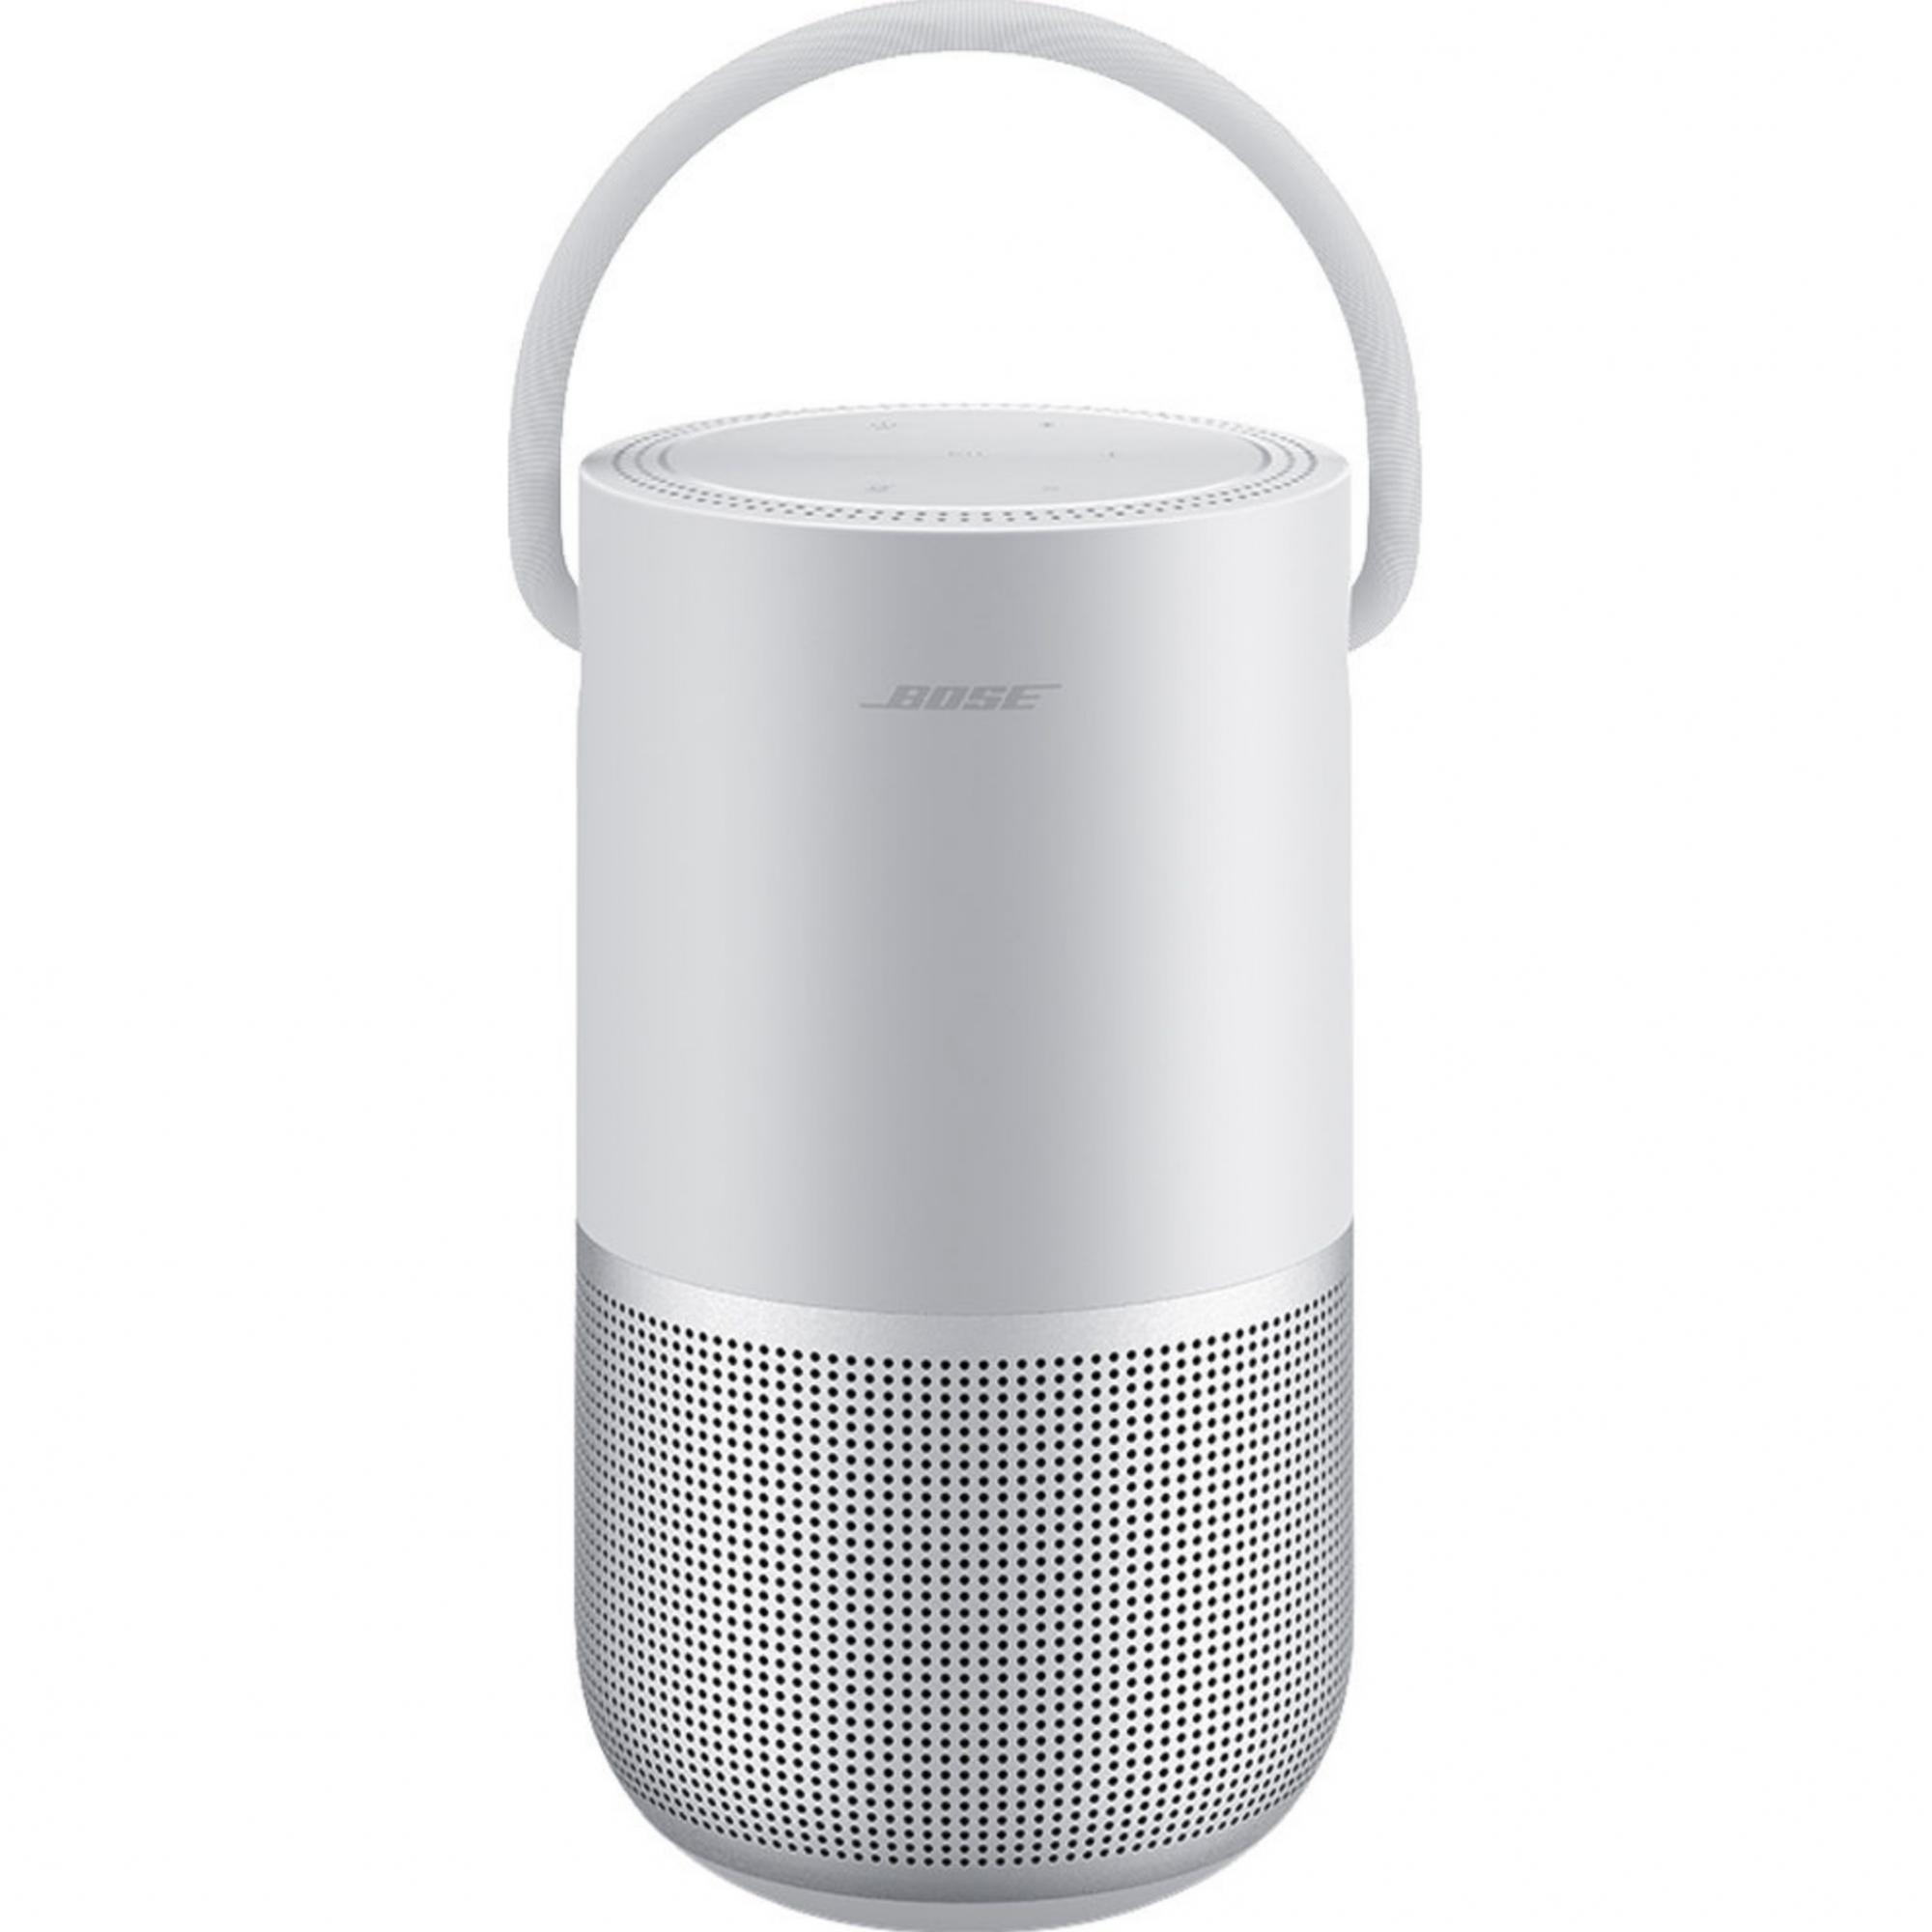 Bose Portable Smart Speaker  Alto-falante portátil inteligente com Wi-Fi integrado, Bluetooth, Google Assistant e Alexa Voice Control - Luxe Silver